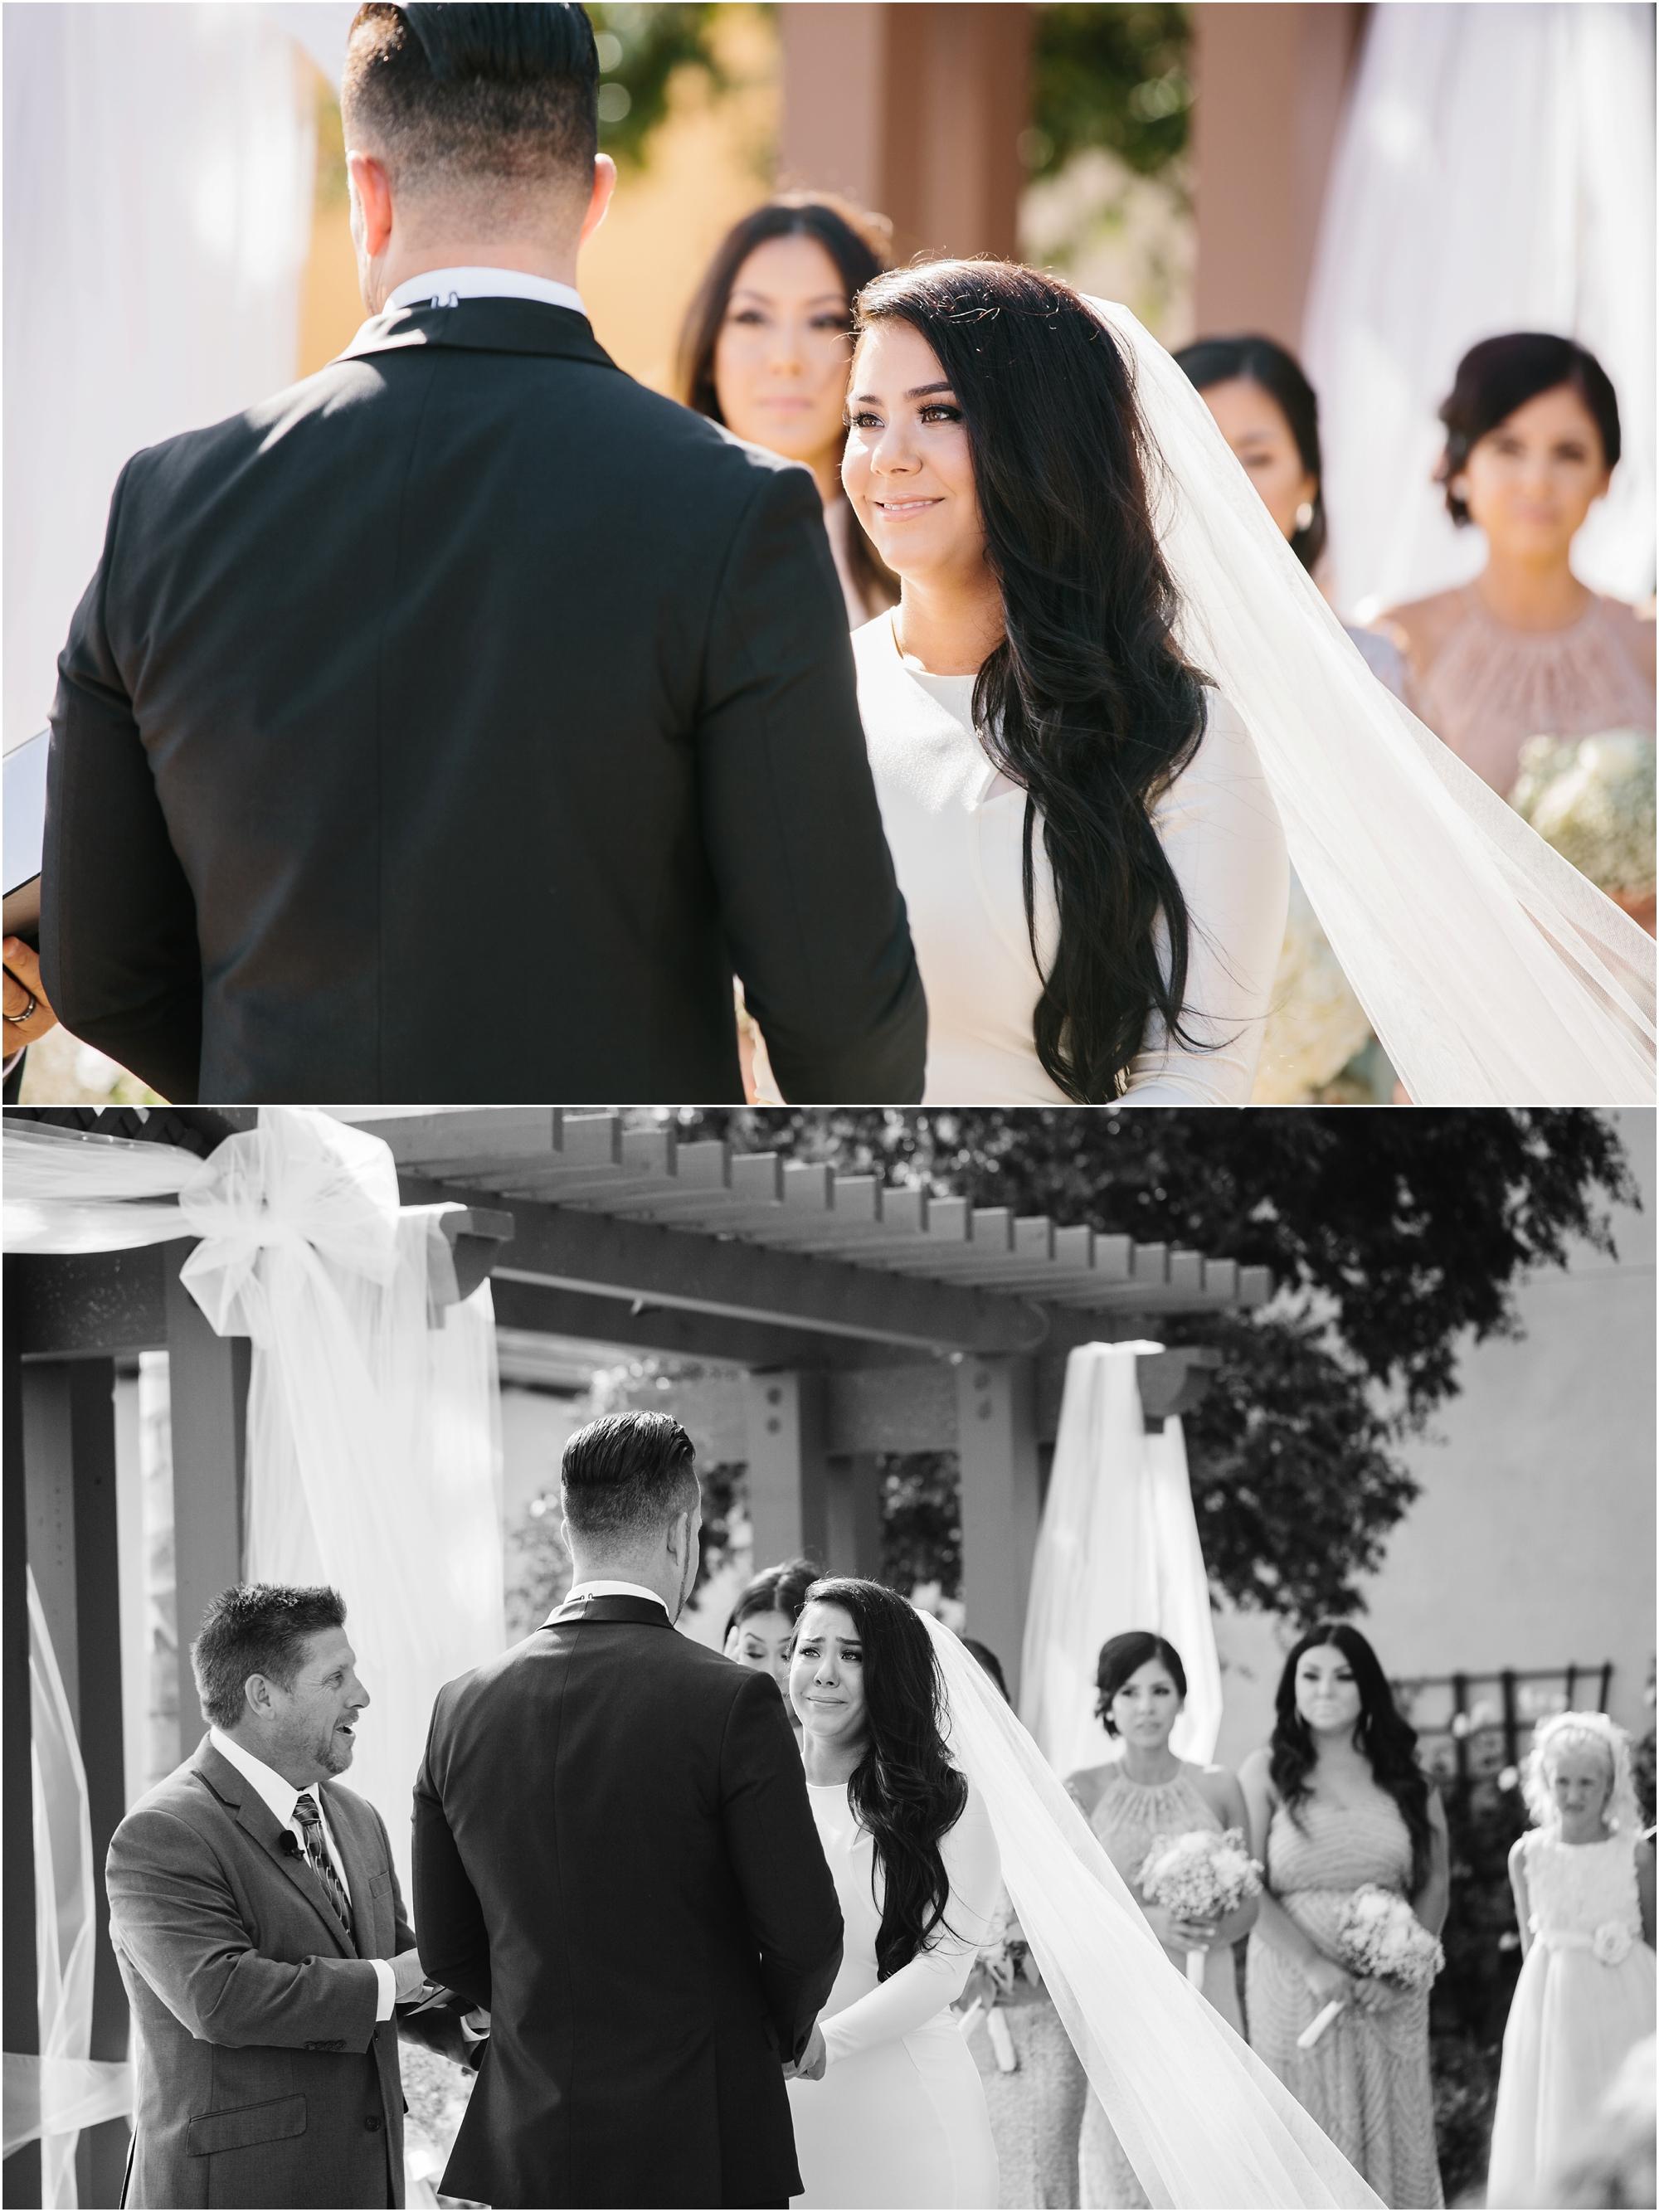 San Diego Wedding - http://brittneyhannonphotography.com